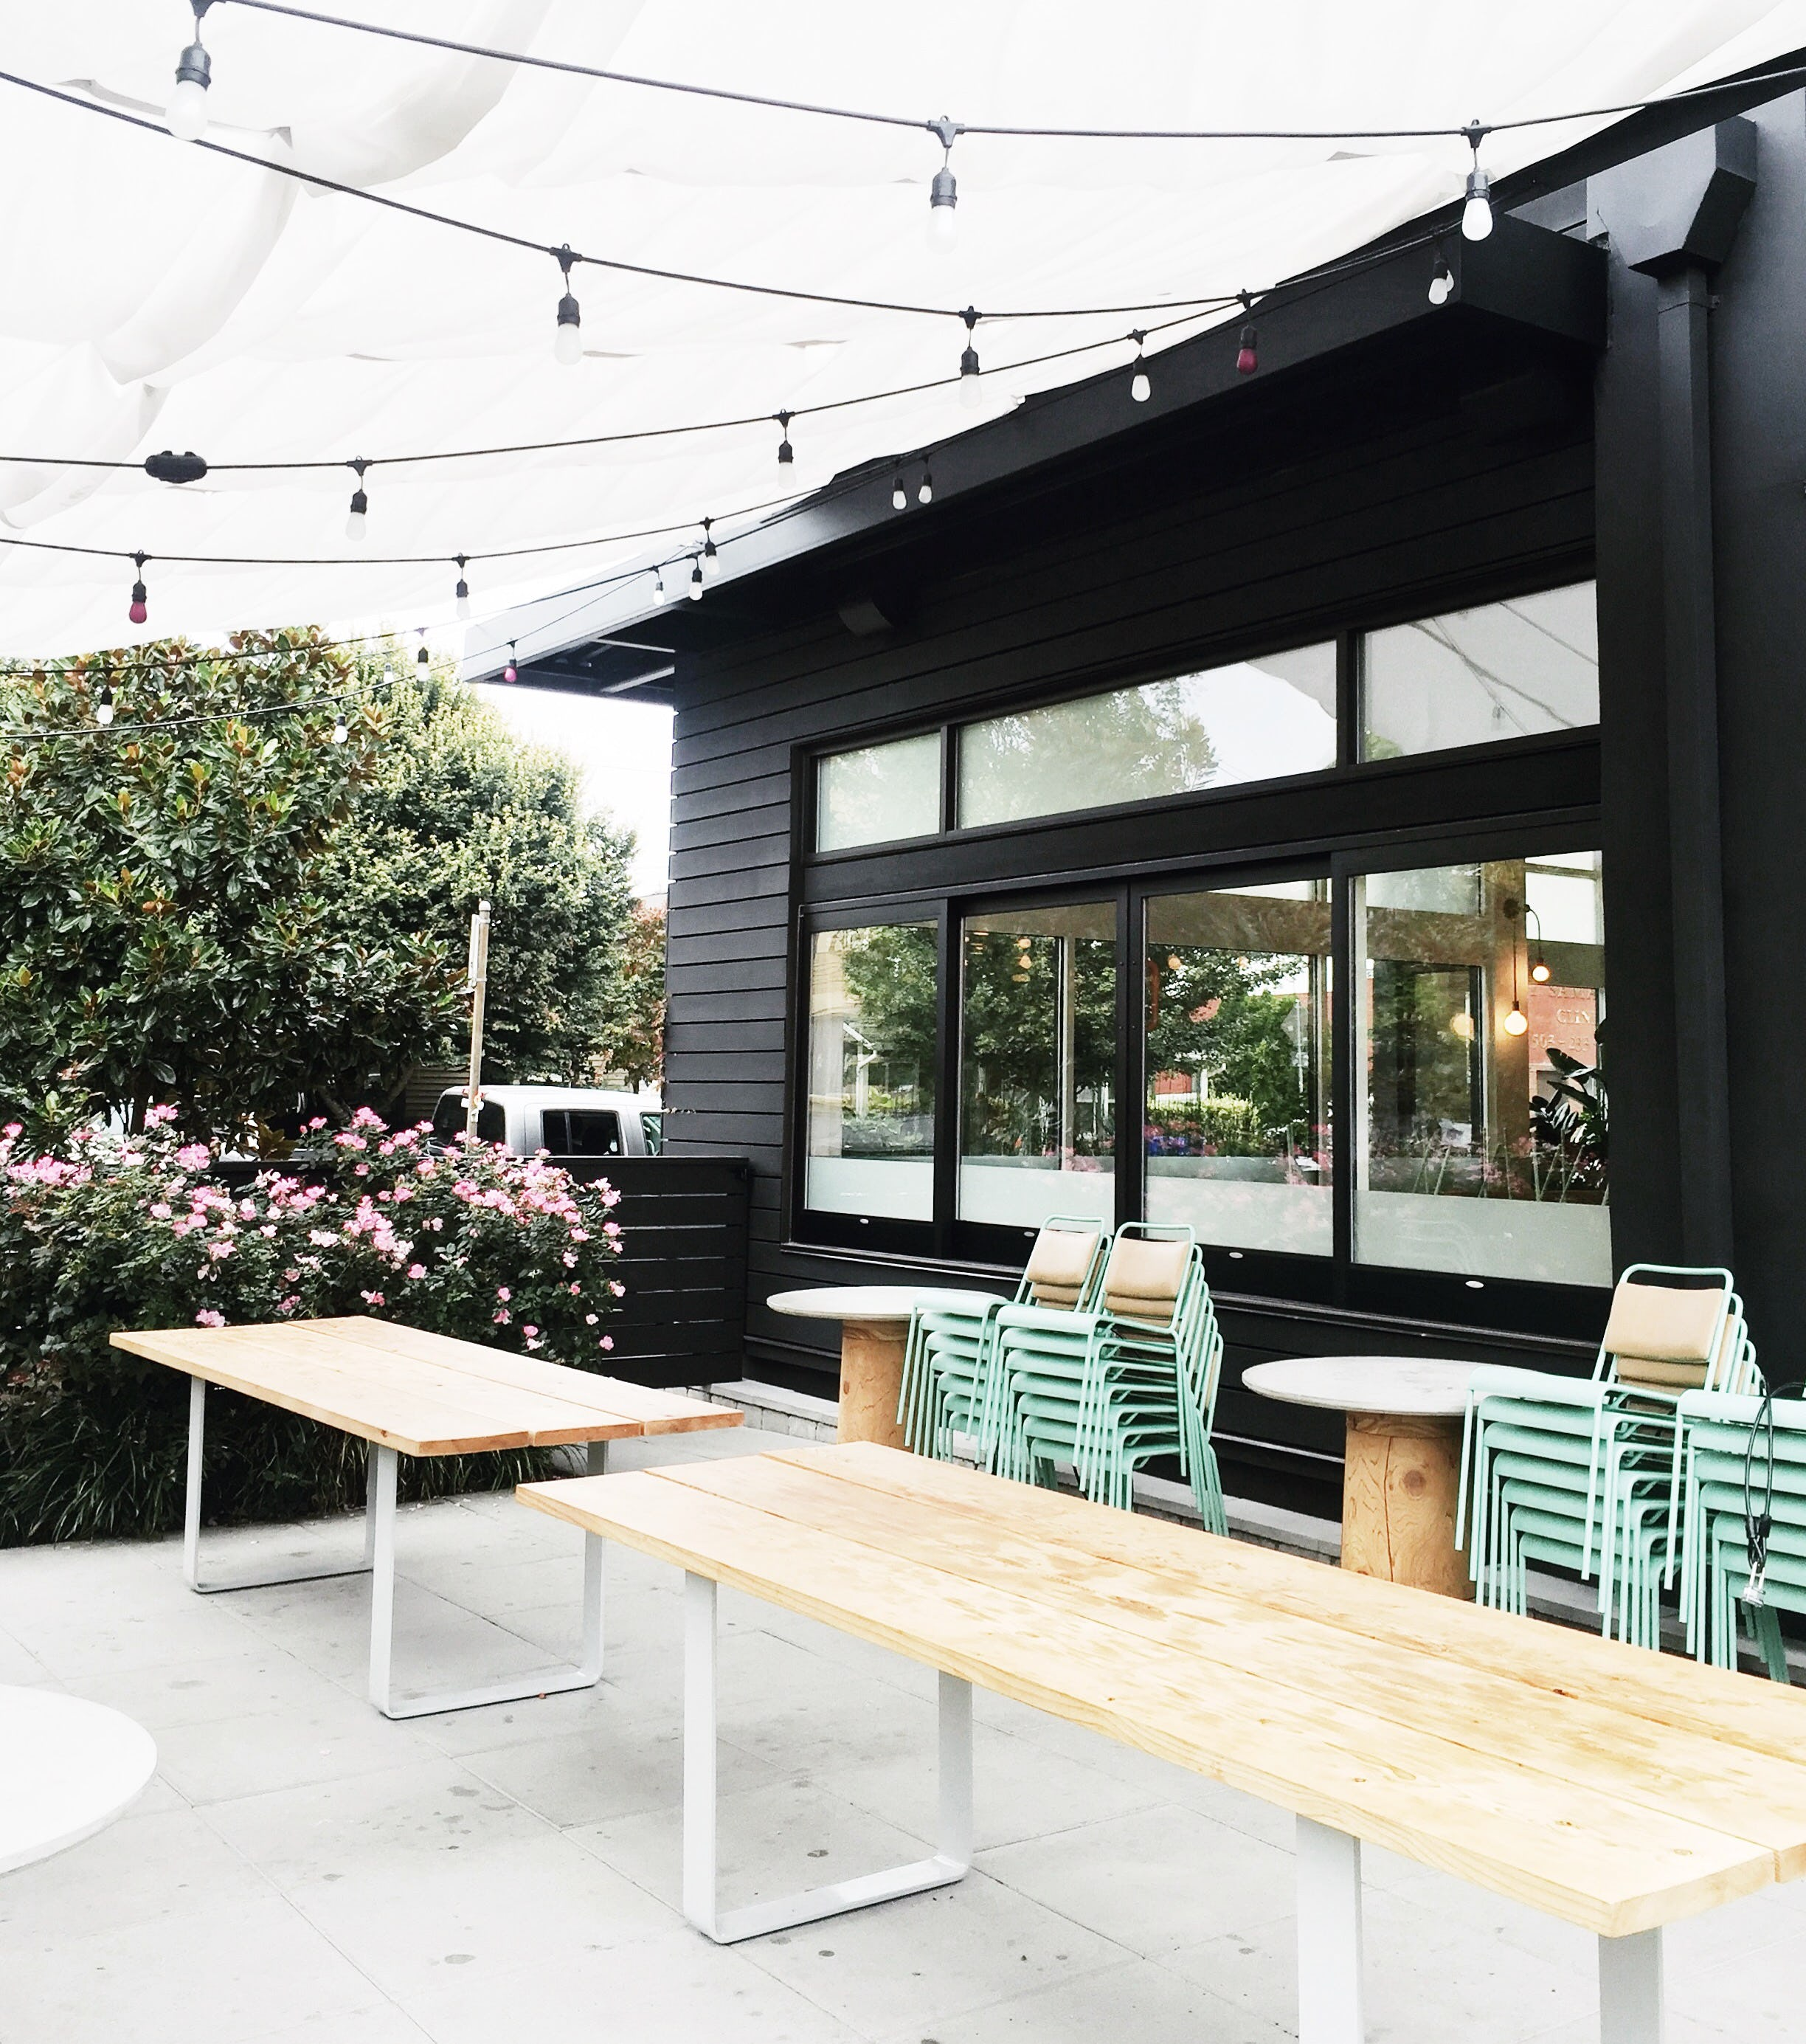 Tusk patio